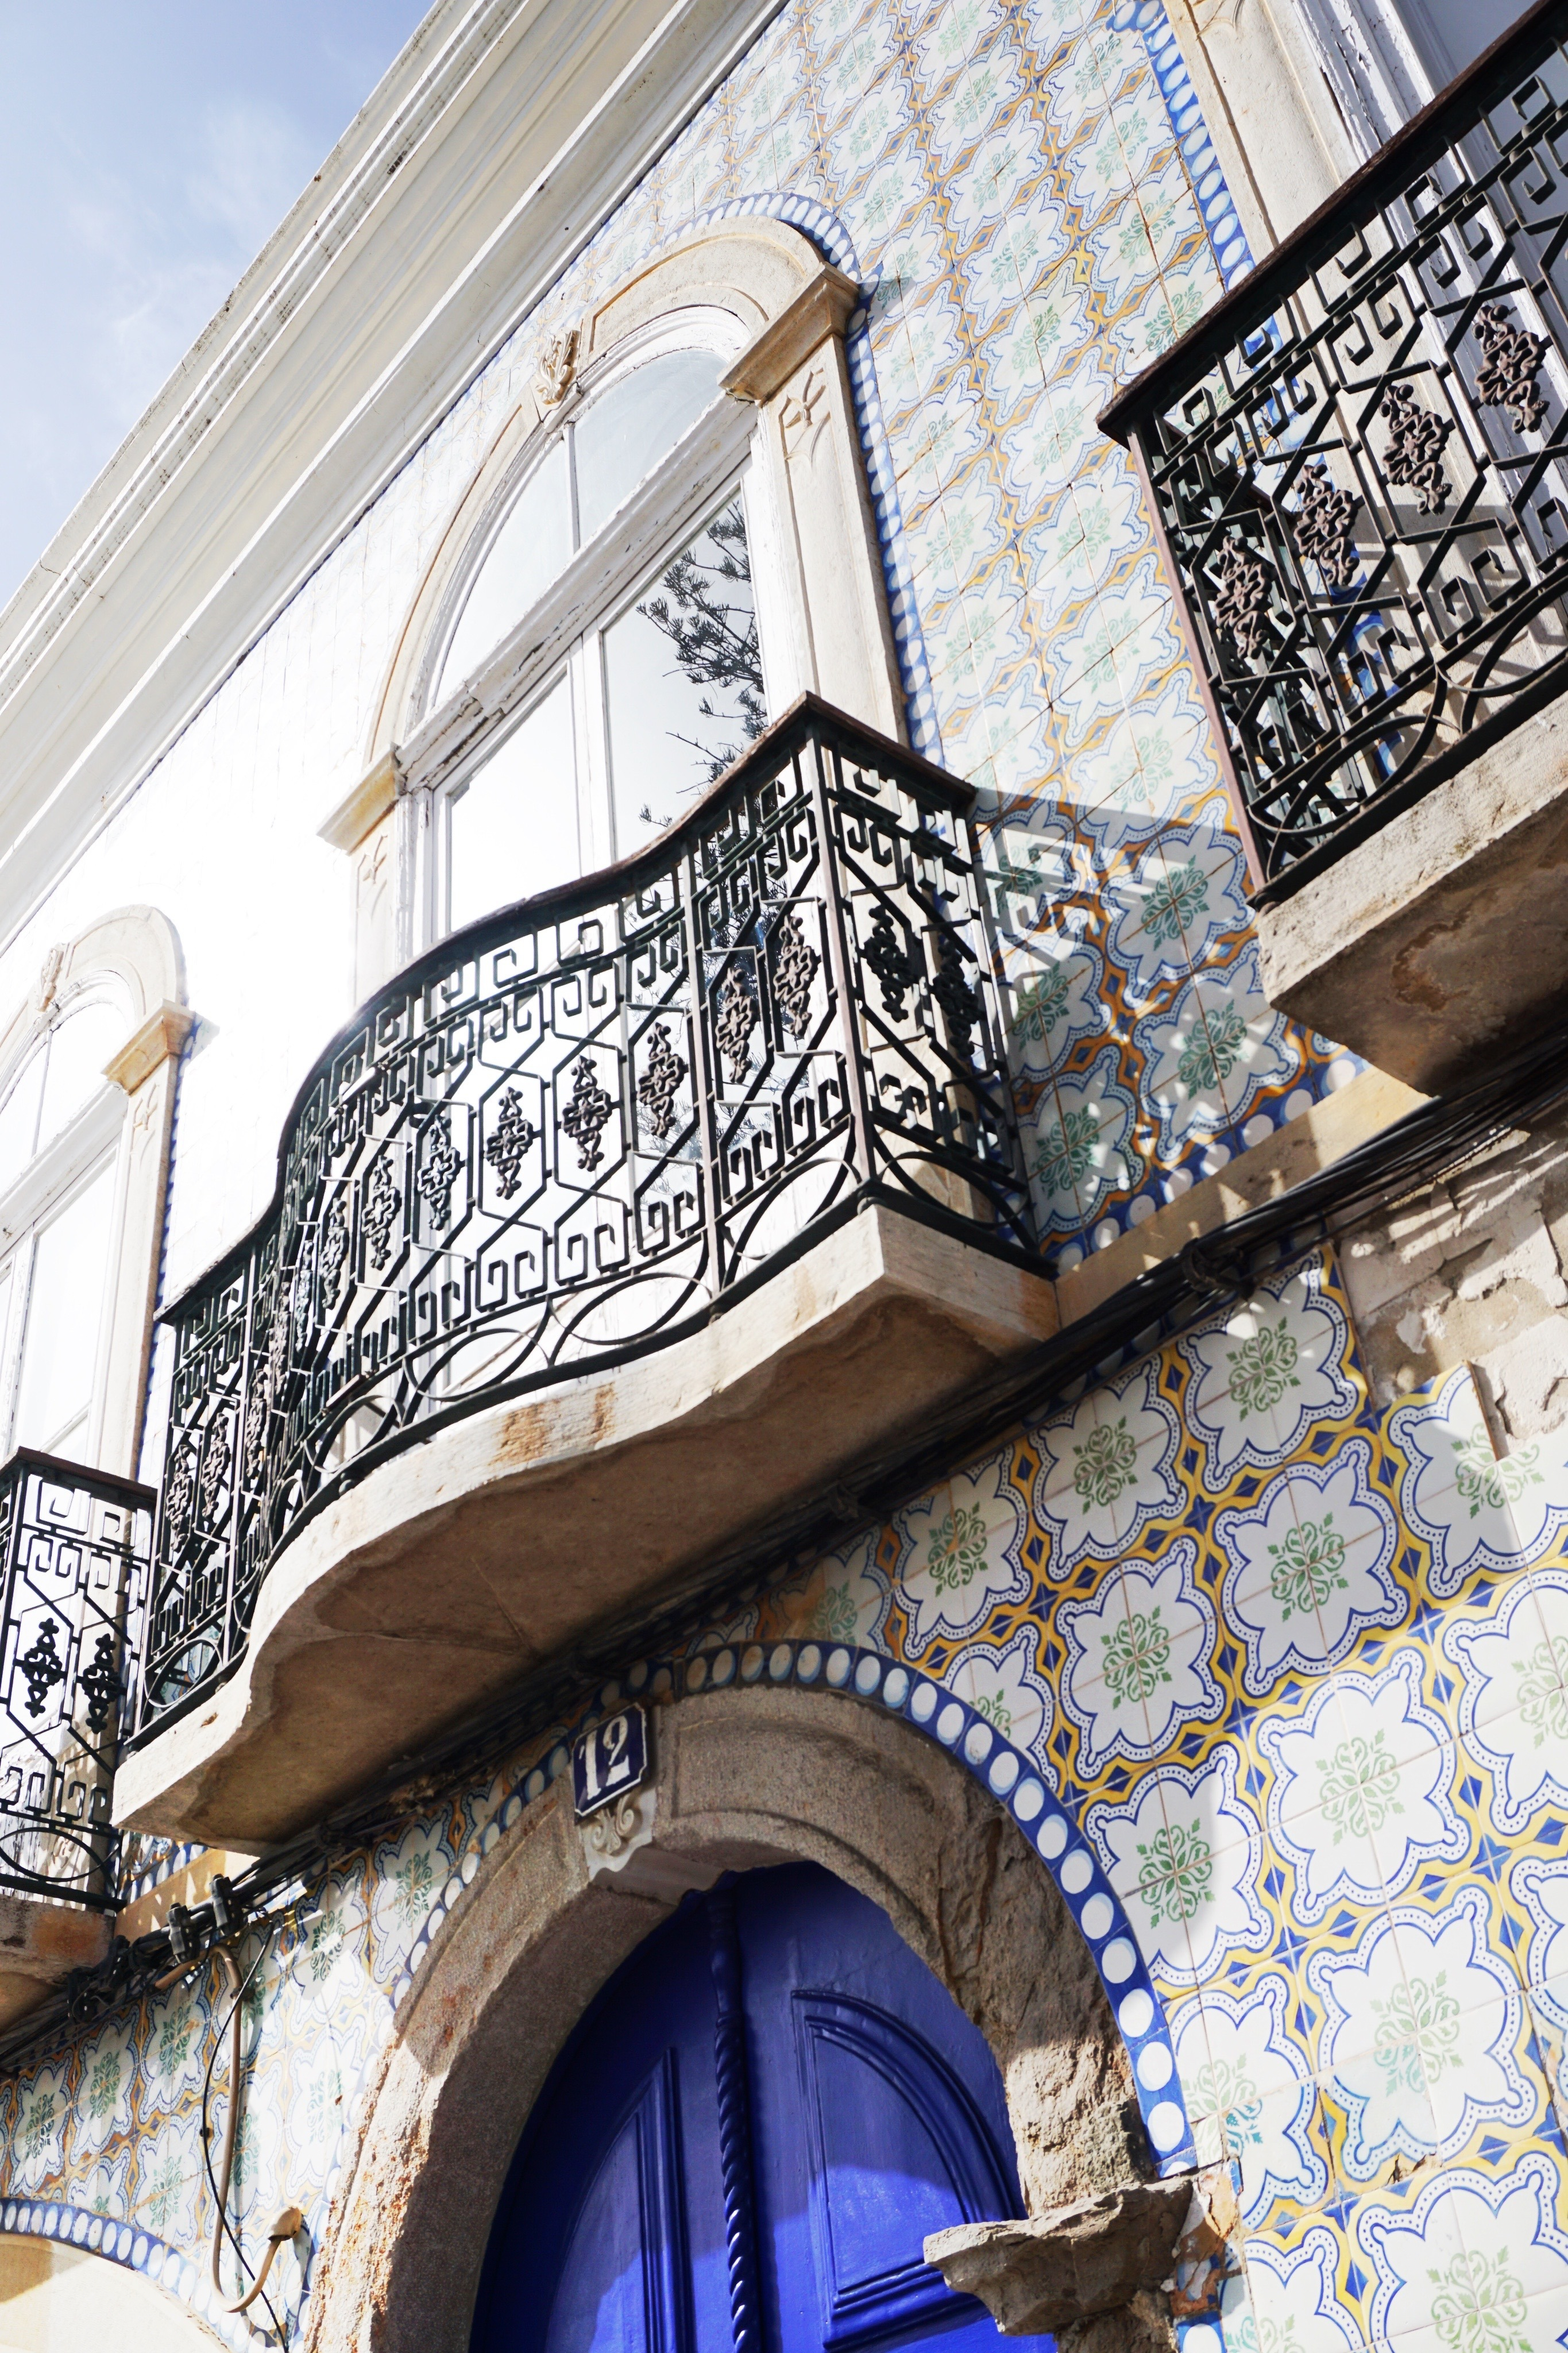 Beautiful tiled house in Tavira, Portugal.